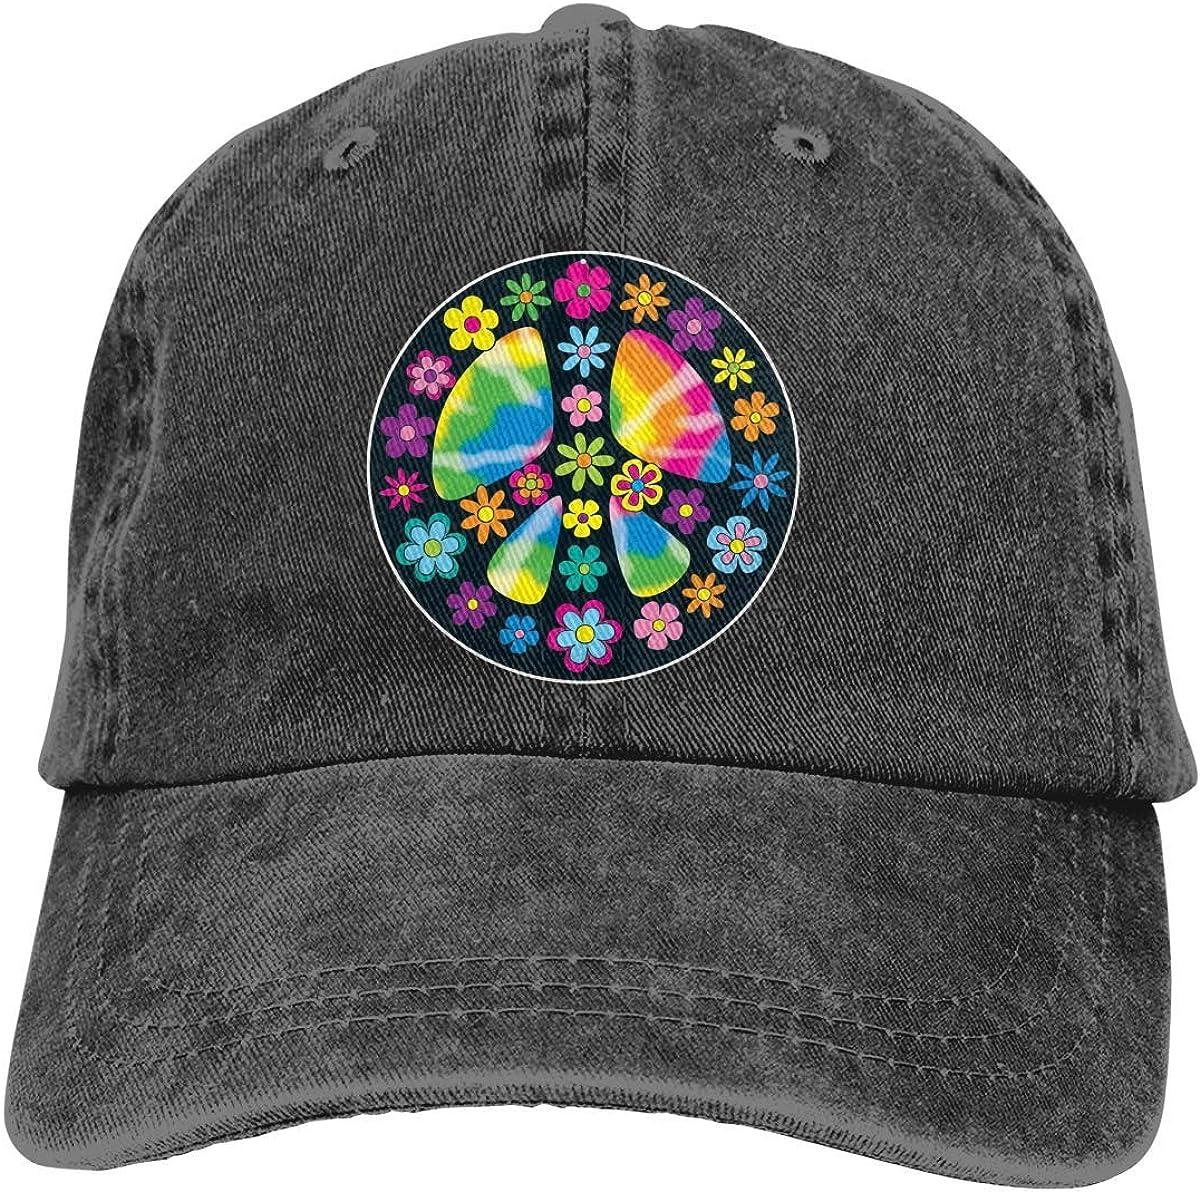 Art Peace Signs Hat Vintage 100% Cotton Washable Adjustable Classic Baseball Cap Unisex Dad Hat